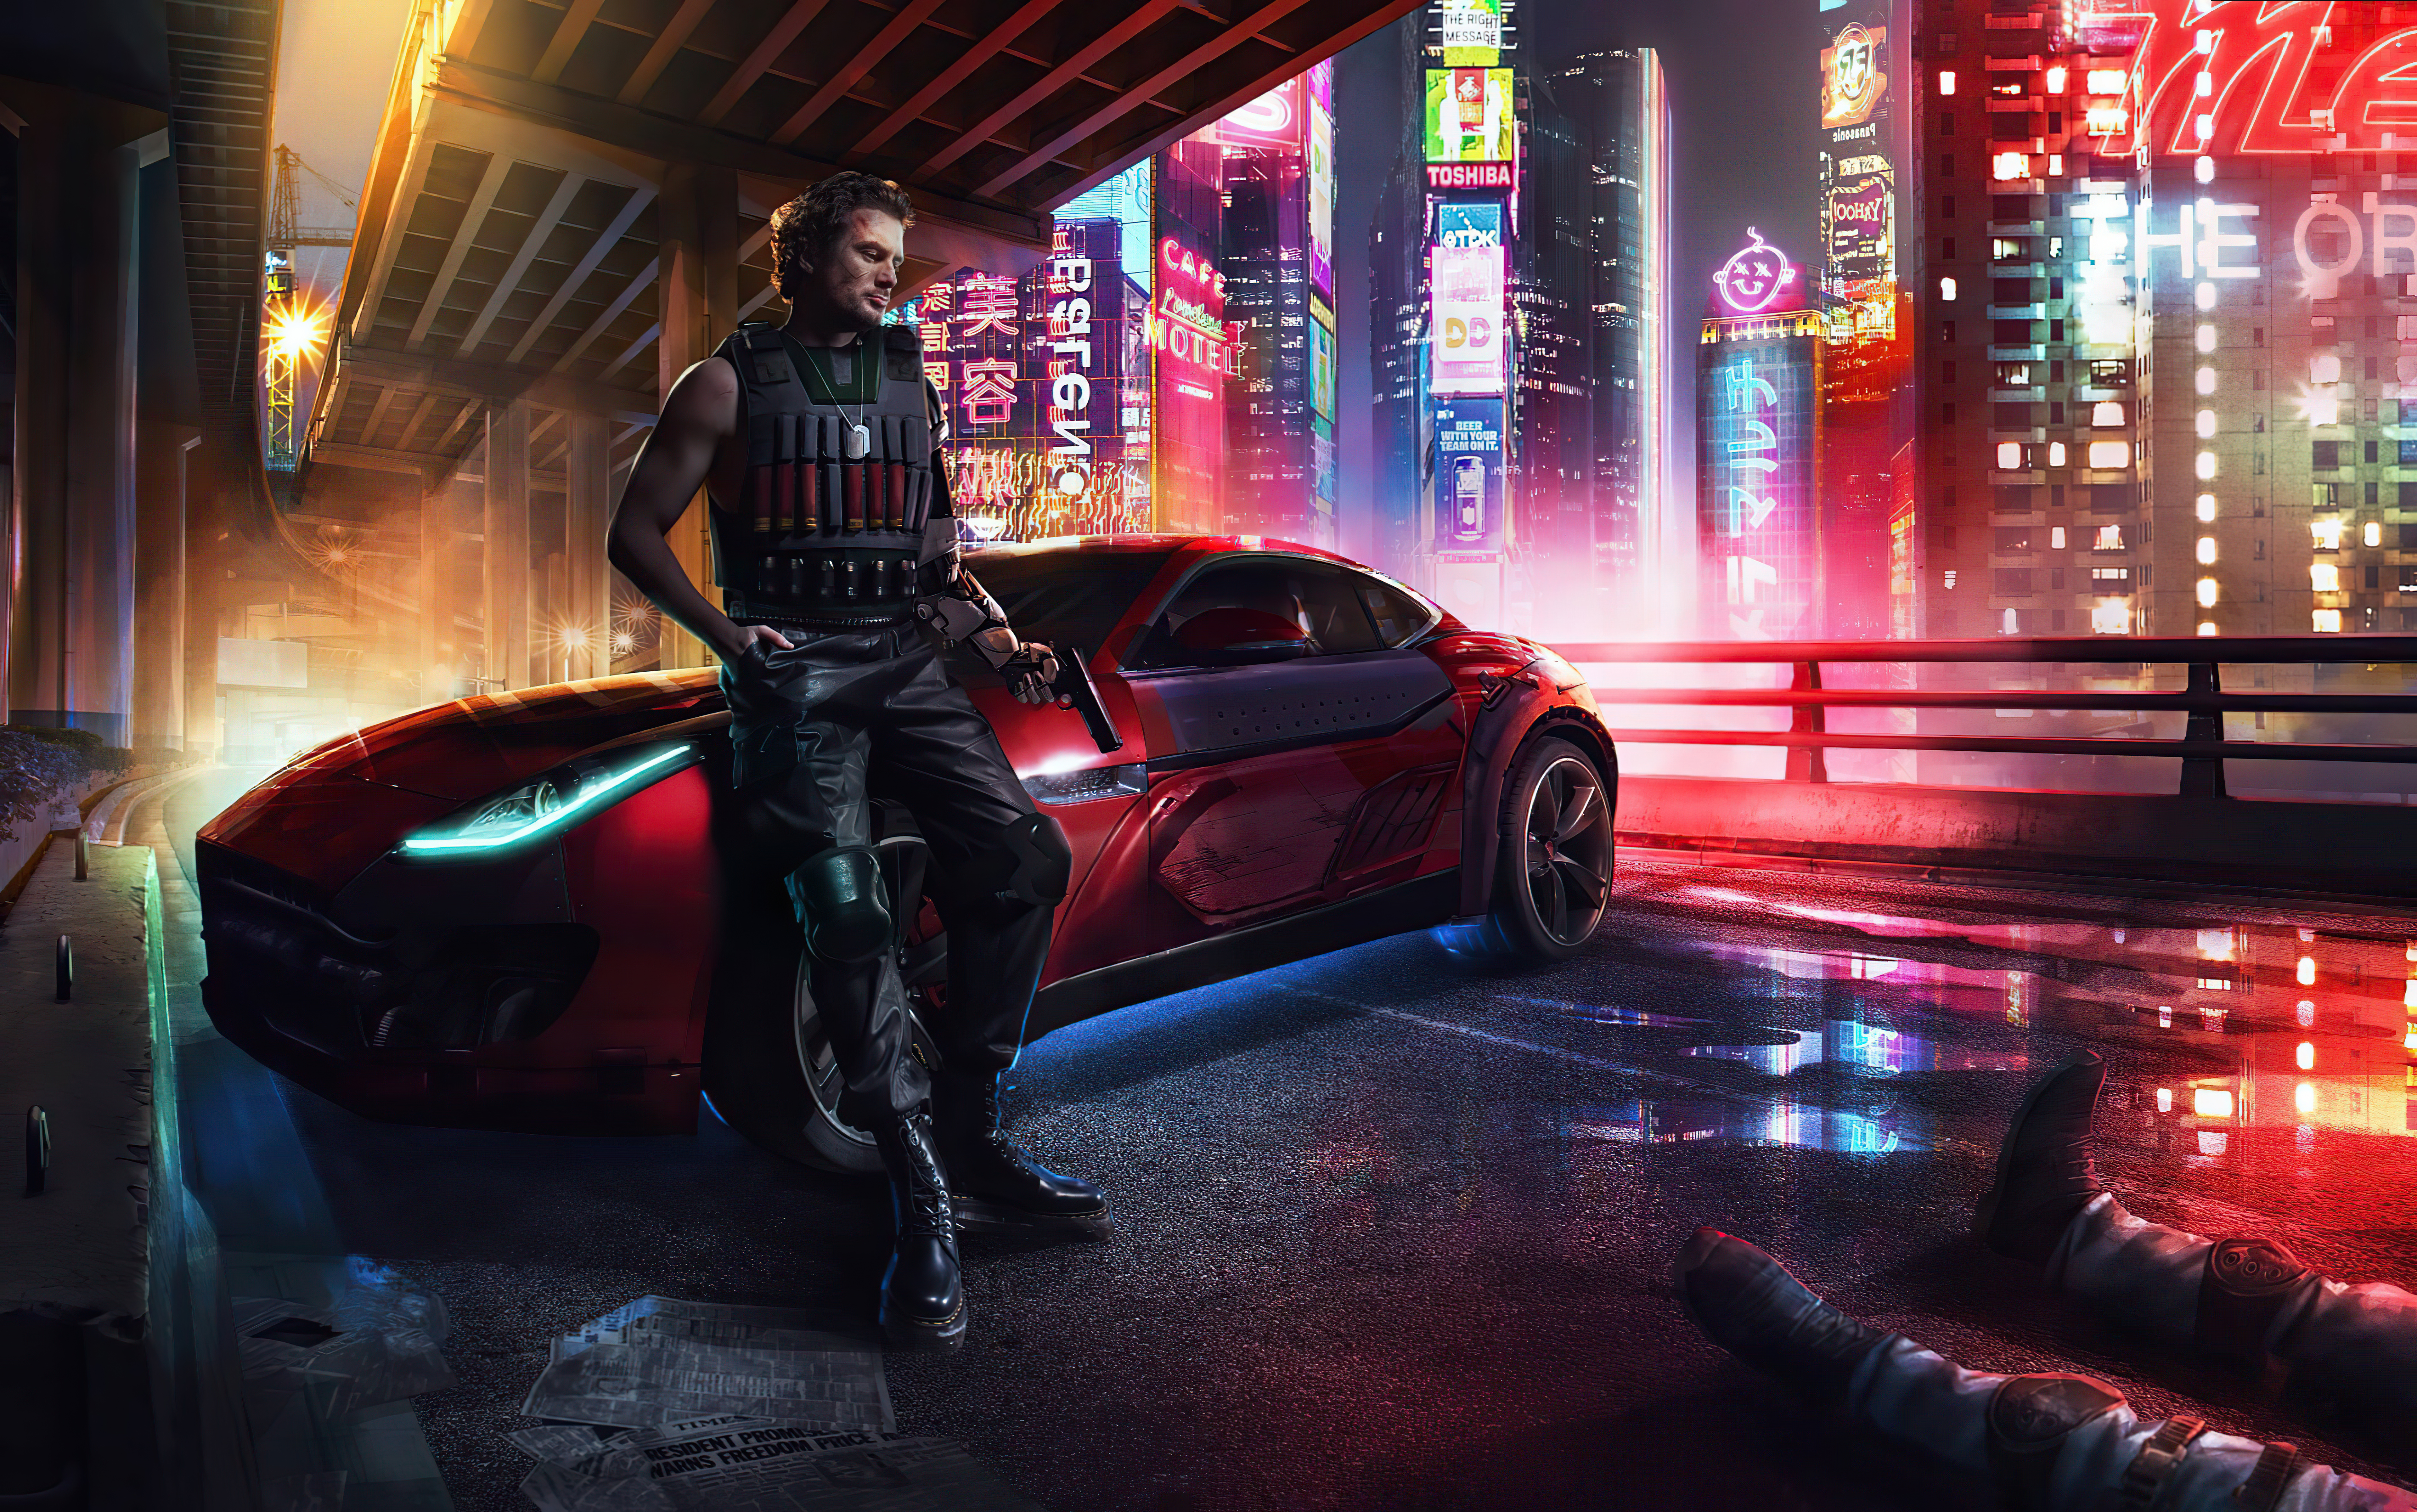 cyberpunk mafia gang boy 4k 1618133345 - Cyberpunk Mafia Gang Boy 4k - Cyberpunk Mafia Gang Boy 4k wallpapers